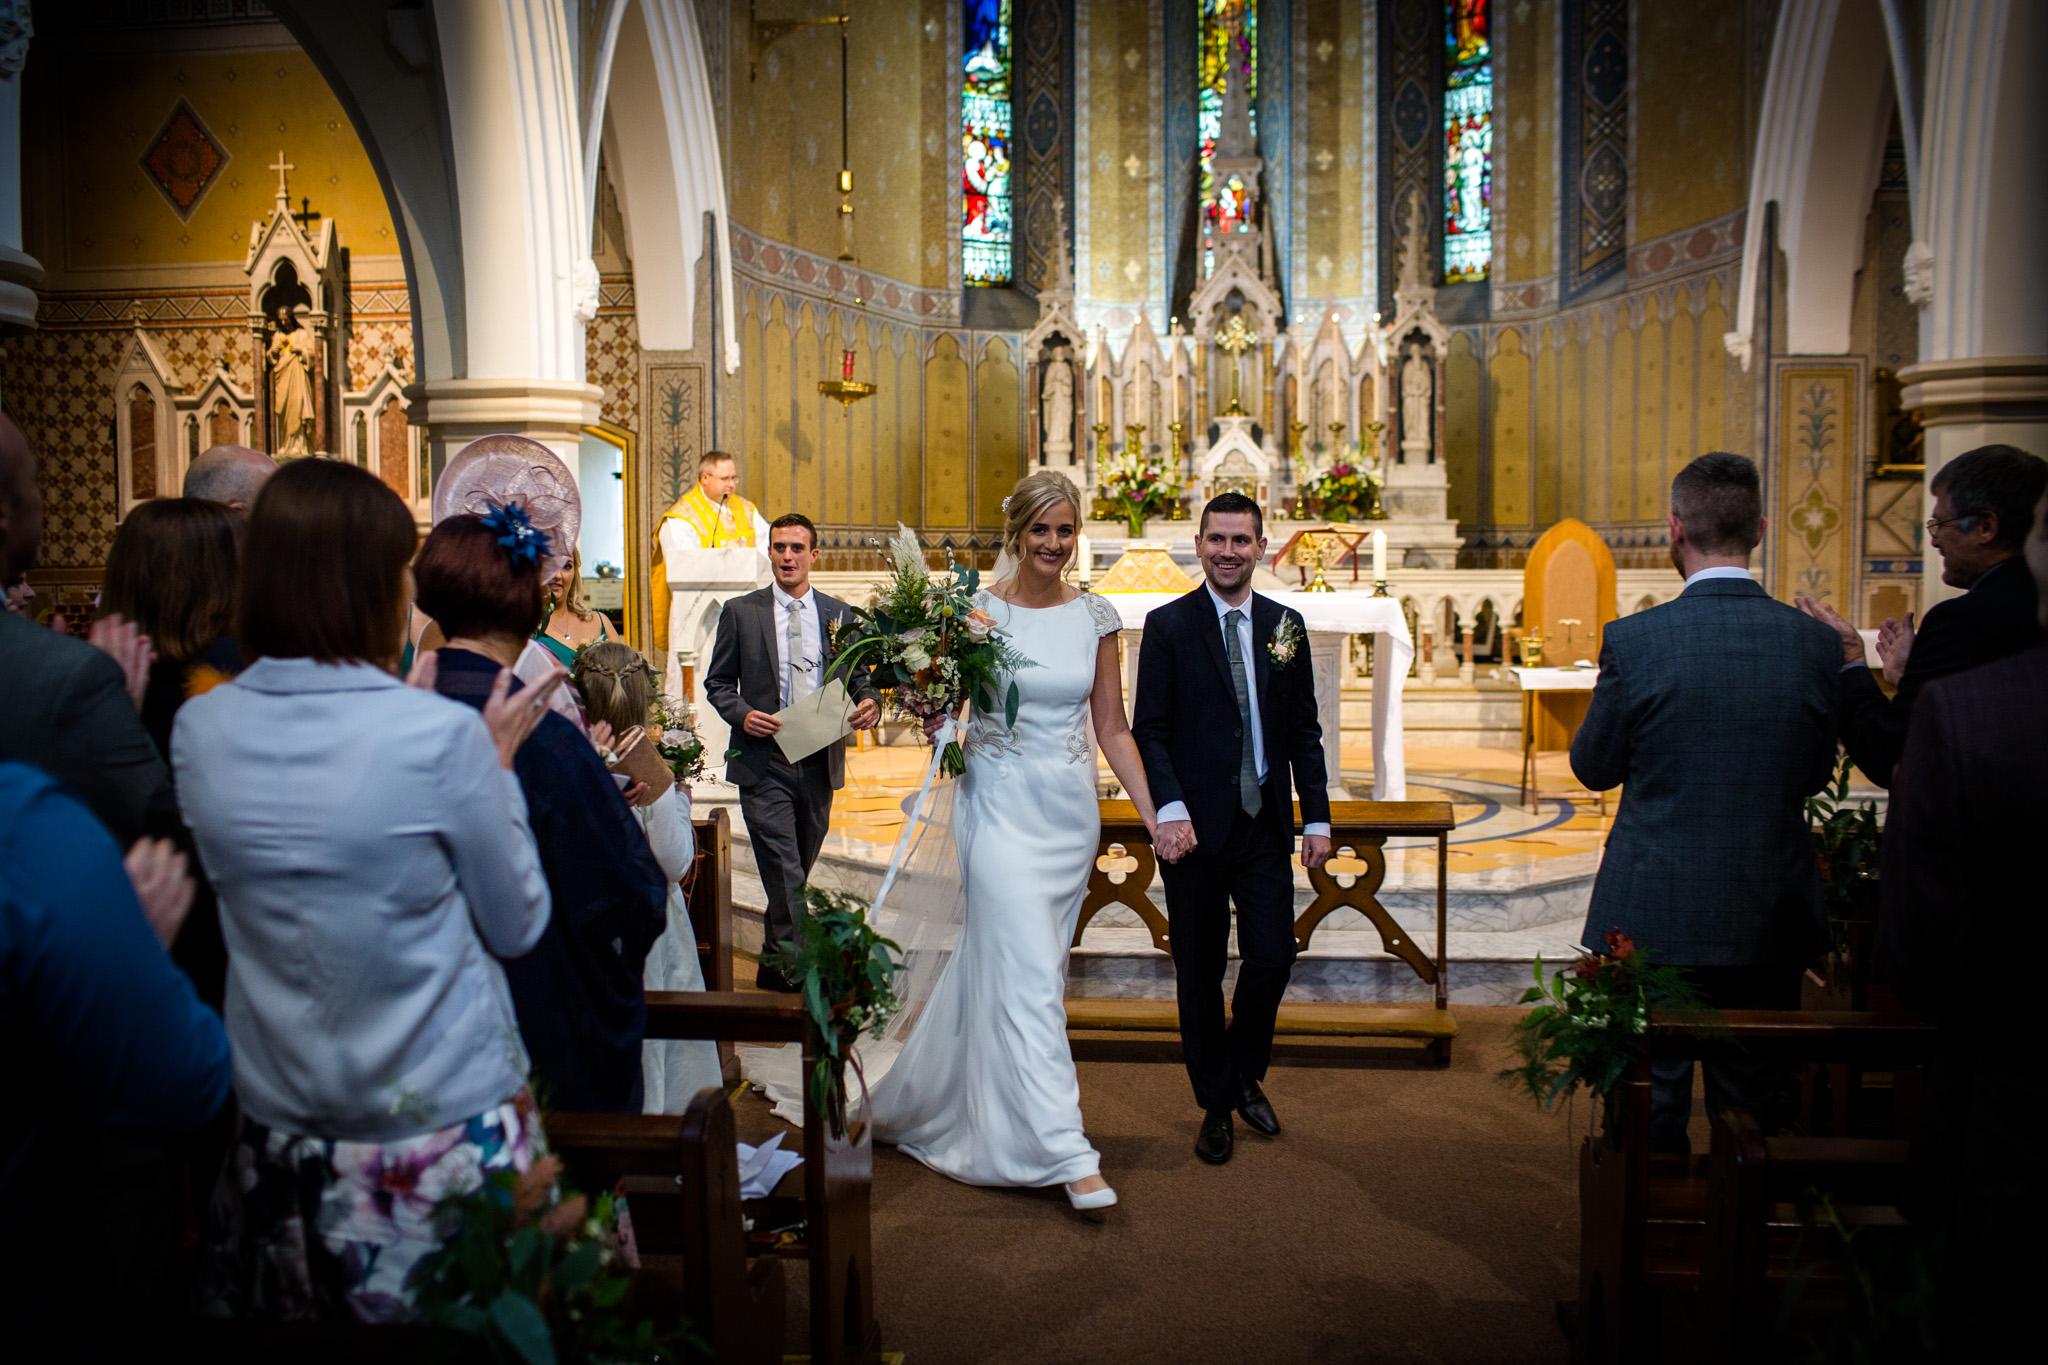 Mark_Barnes_Northern_Ireland_Wedding_Photography_Ballyscullion_Park_Wedding_Photography_Stef&Bobby-25.jpg